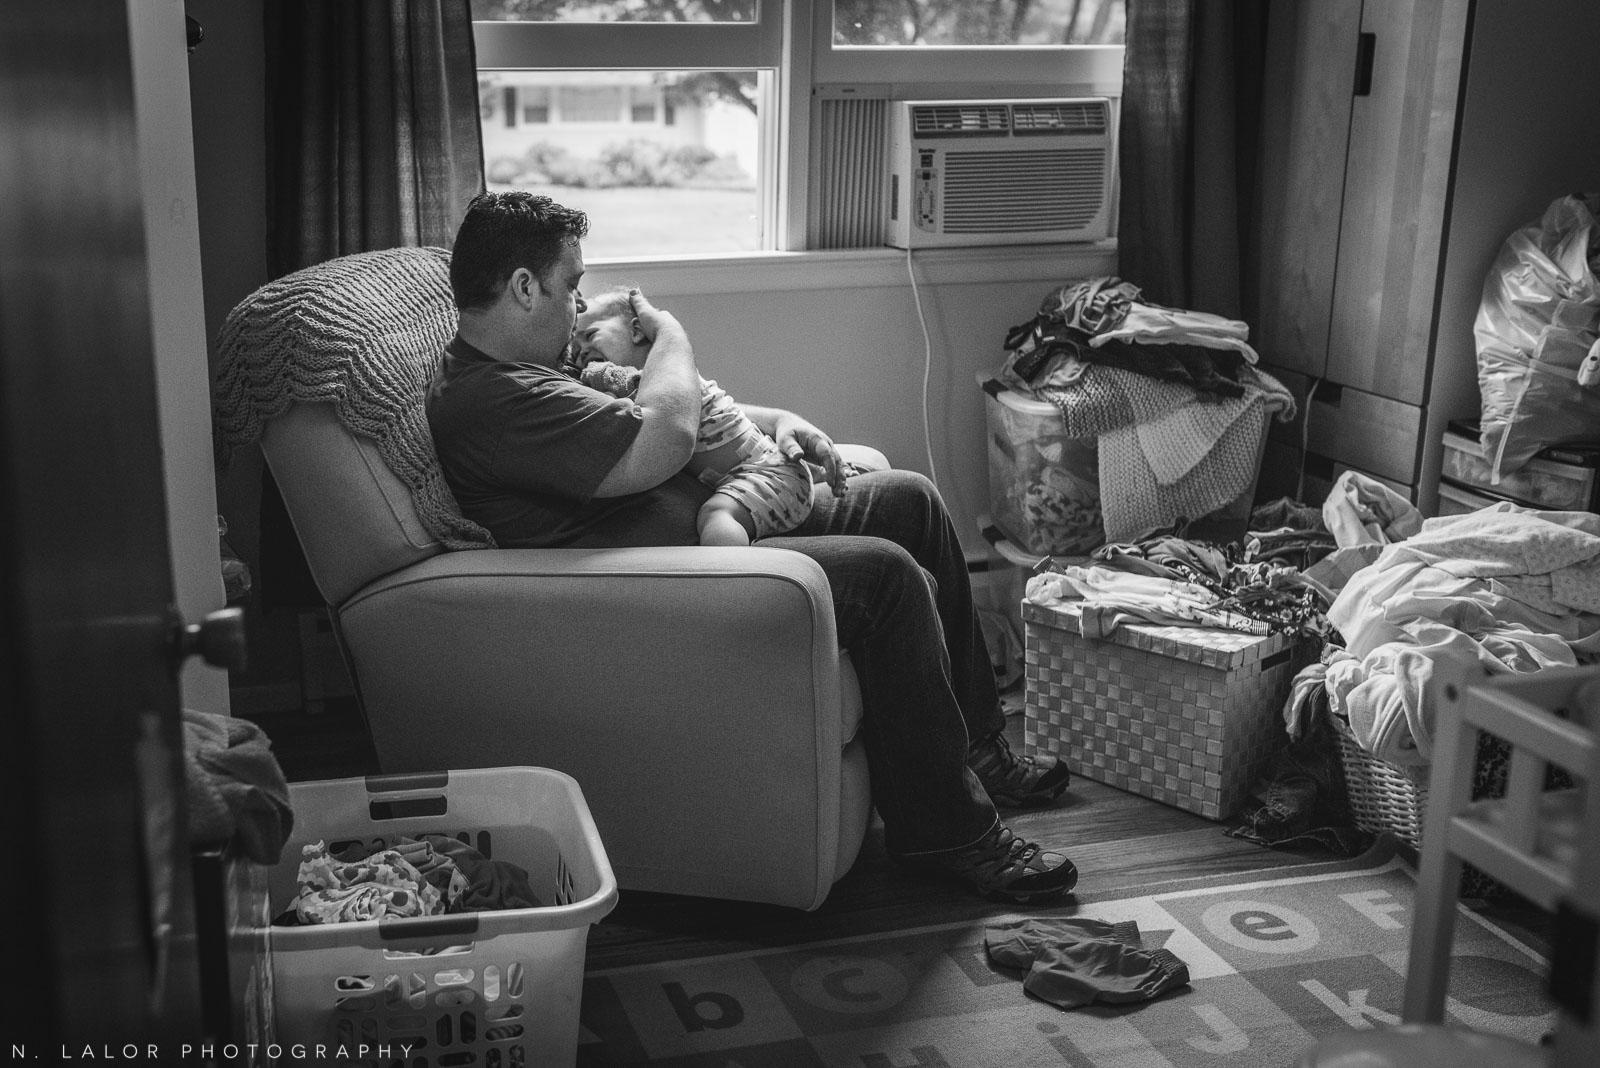 nlalor-photography-2015-one-morning-kim-documentary-photo-session-15.jpg